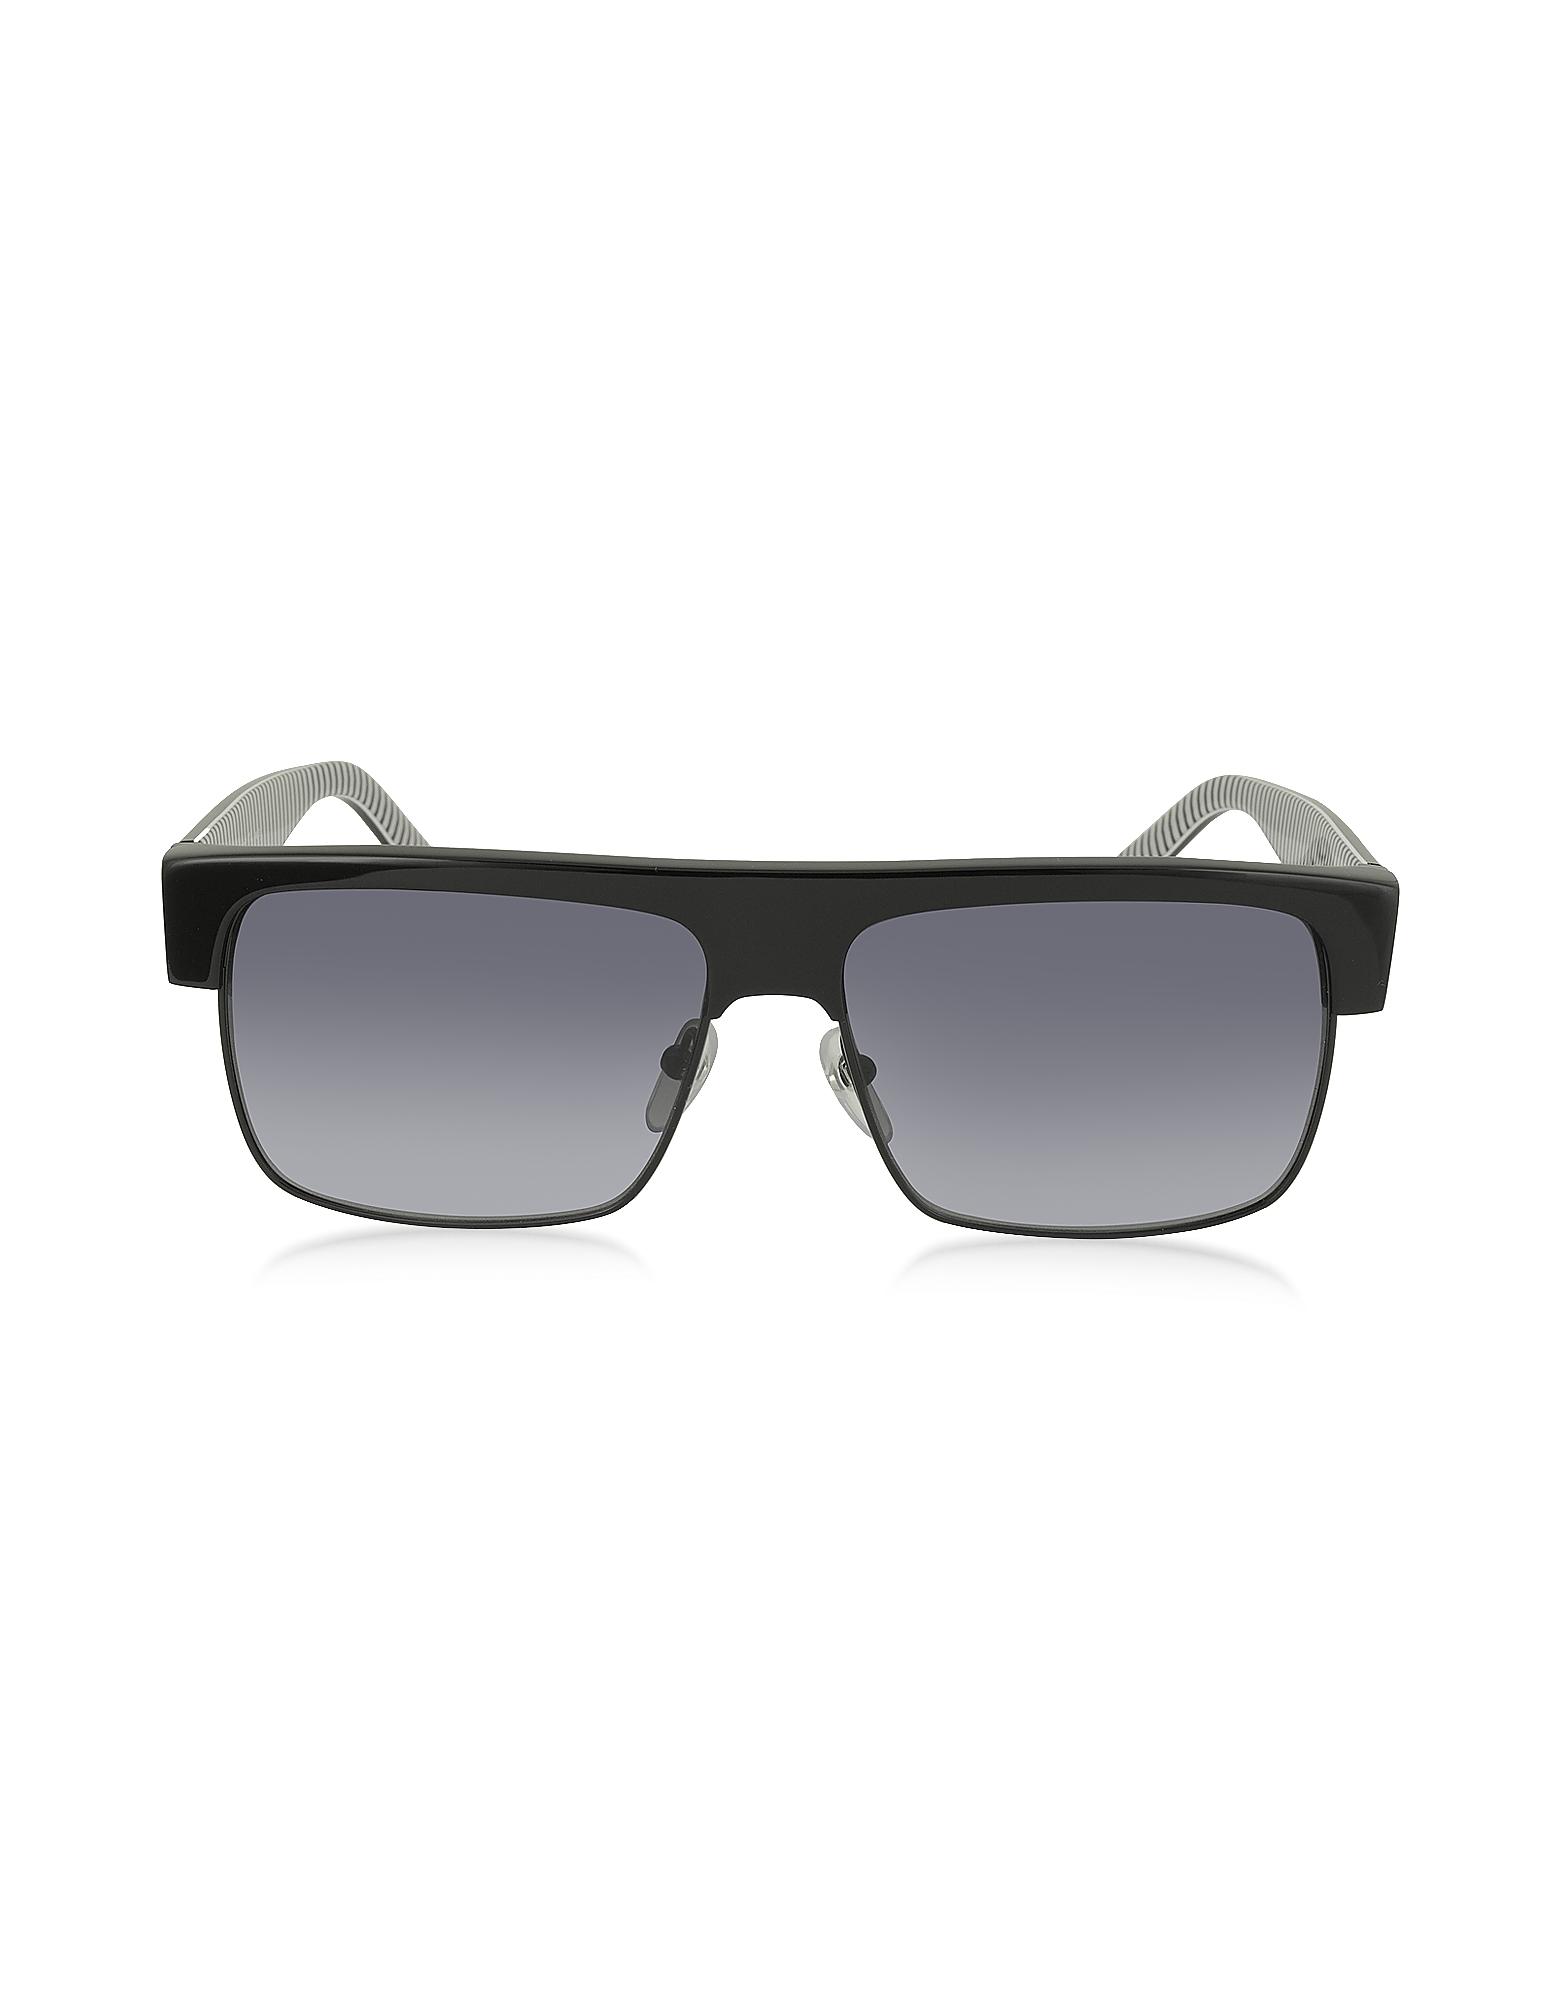 Marc Jacobs Sunglasses, MARC 56/S Acetate and Metal Men's Sunglasses